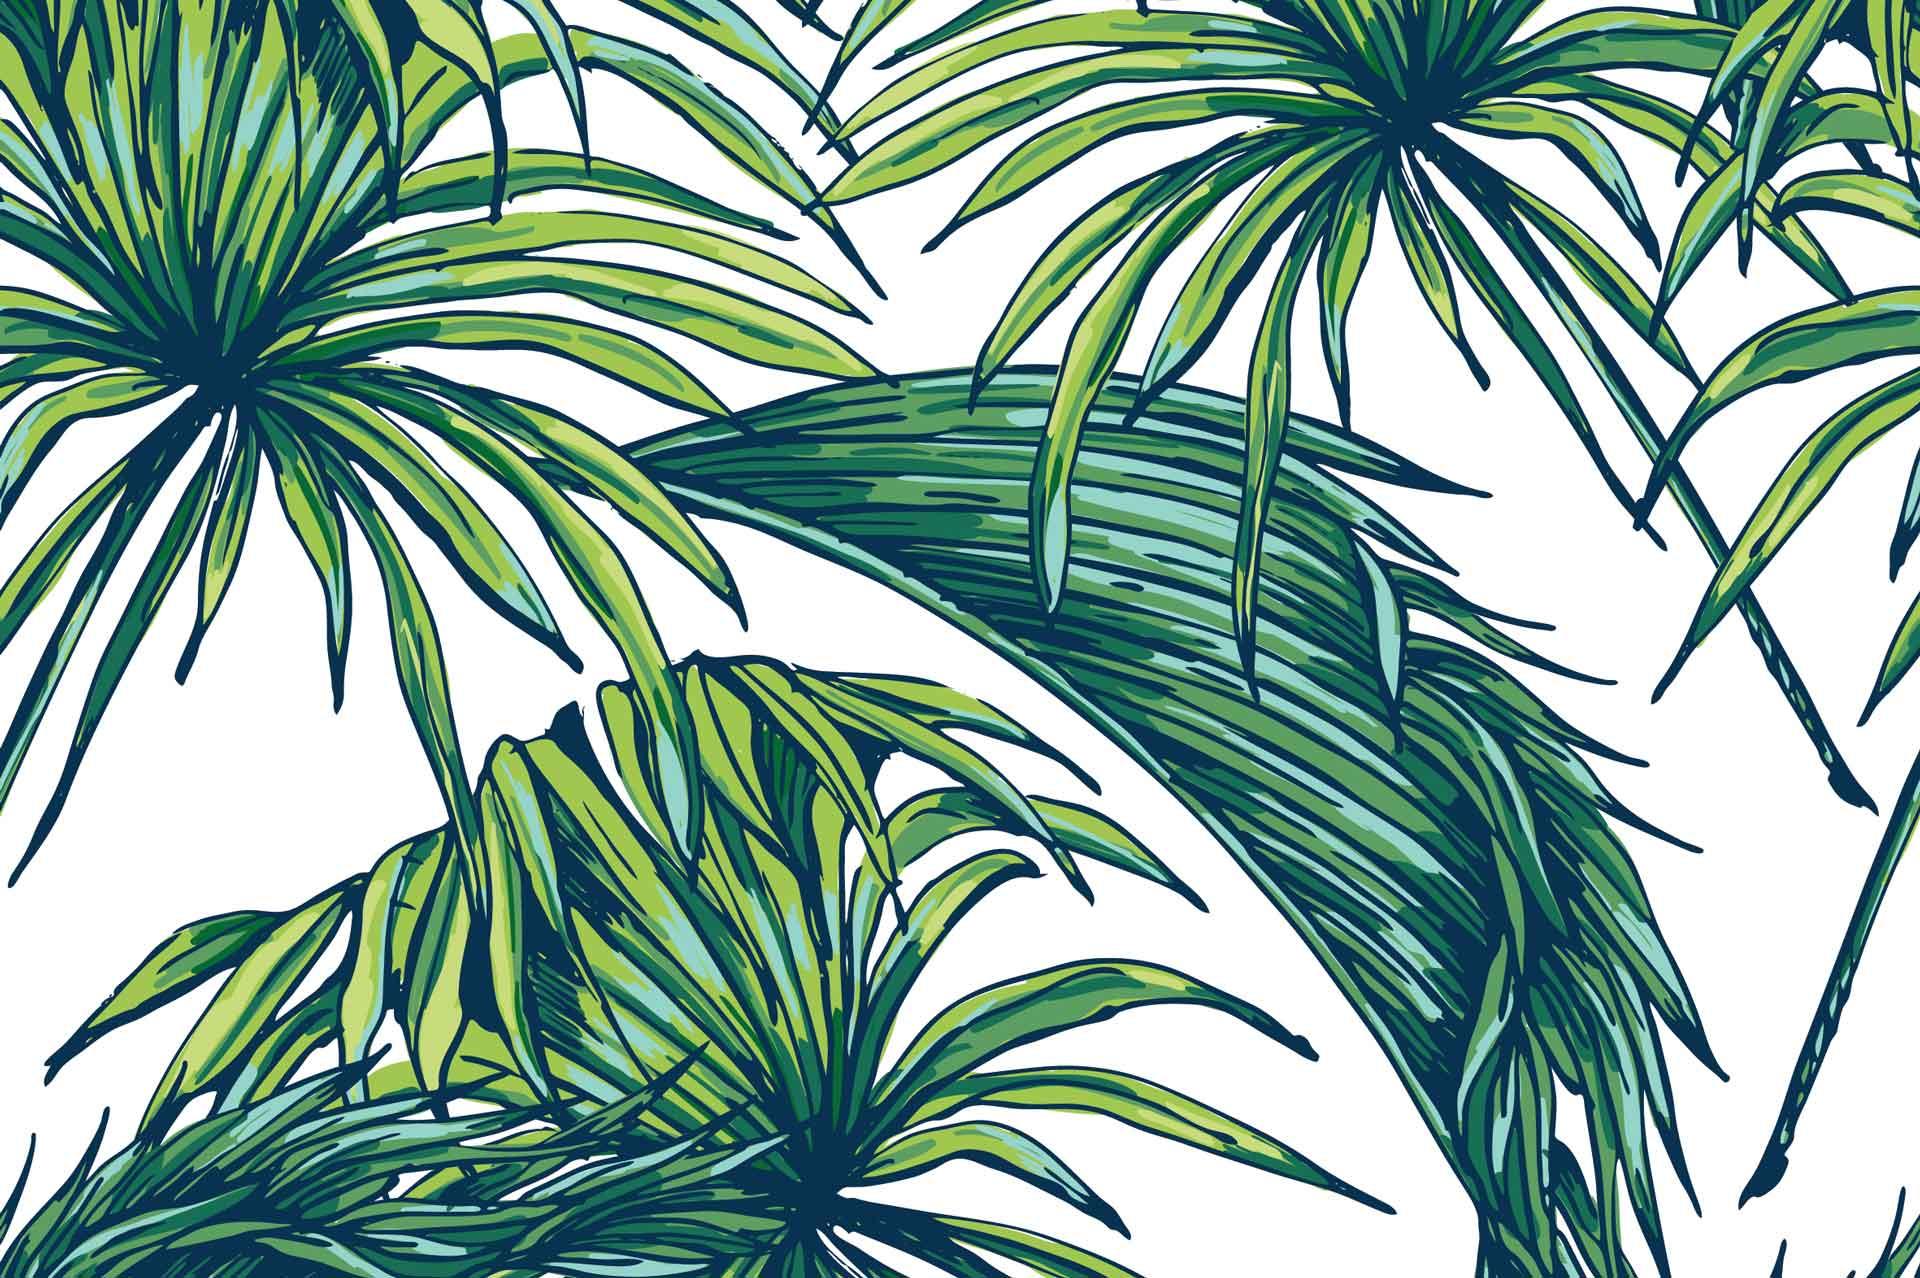 Palm Leaf Wallpapers On Wallpaperdog